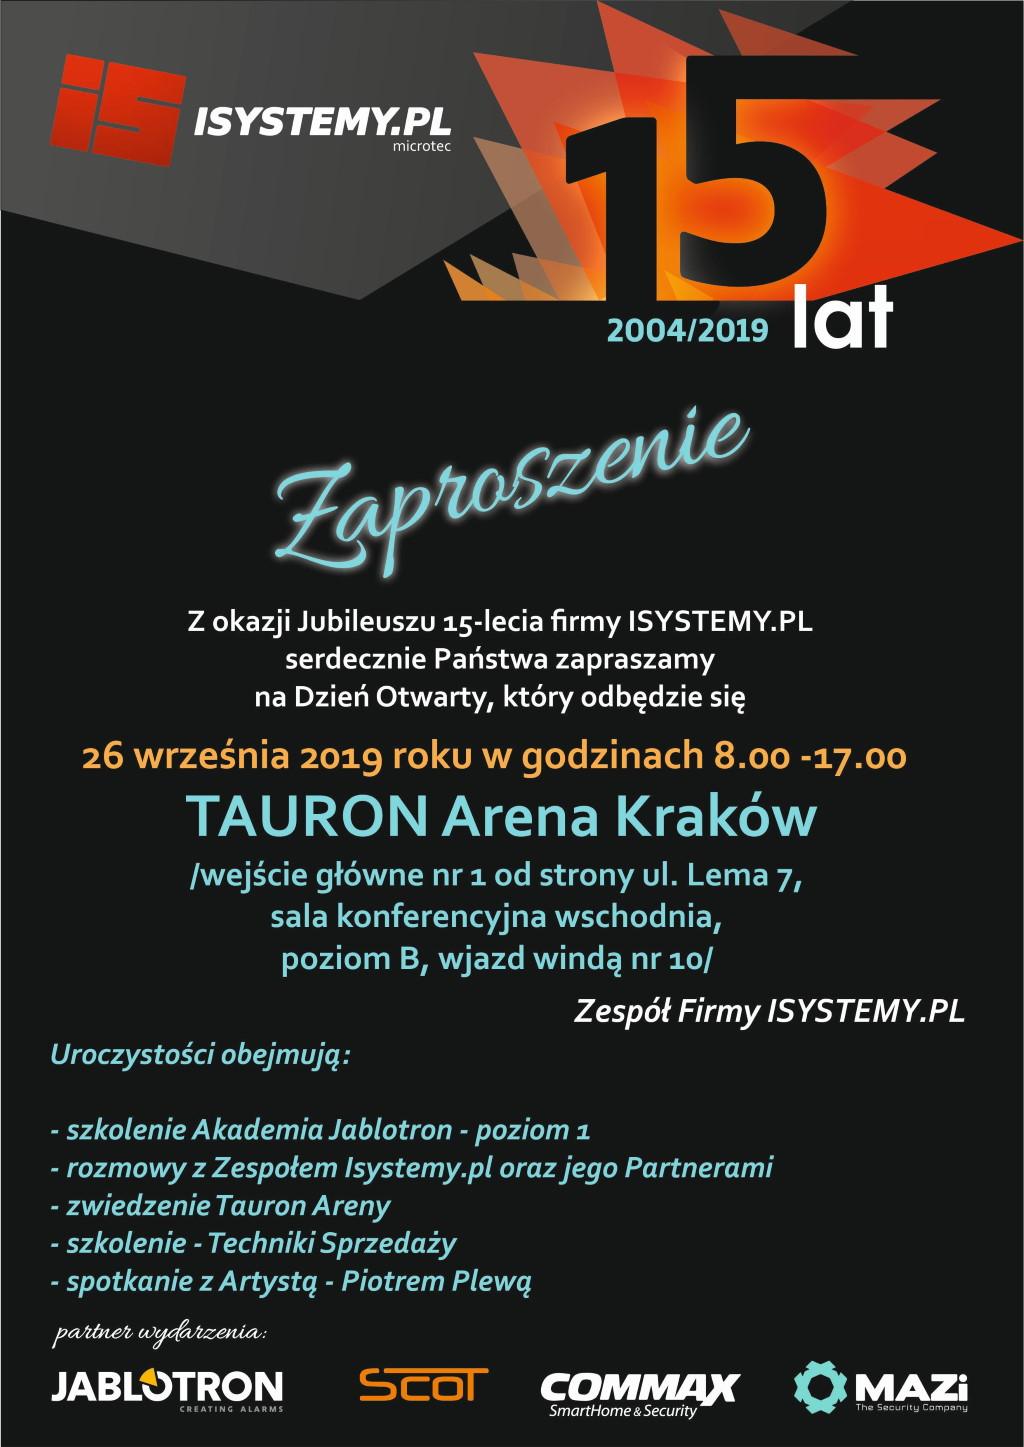 Isystemy.pl ma już 15 lat!